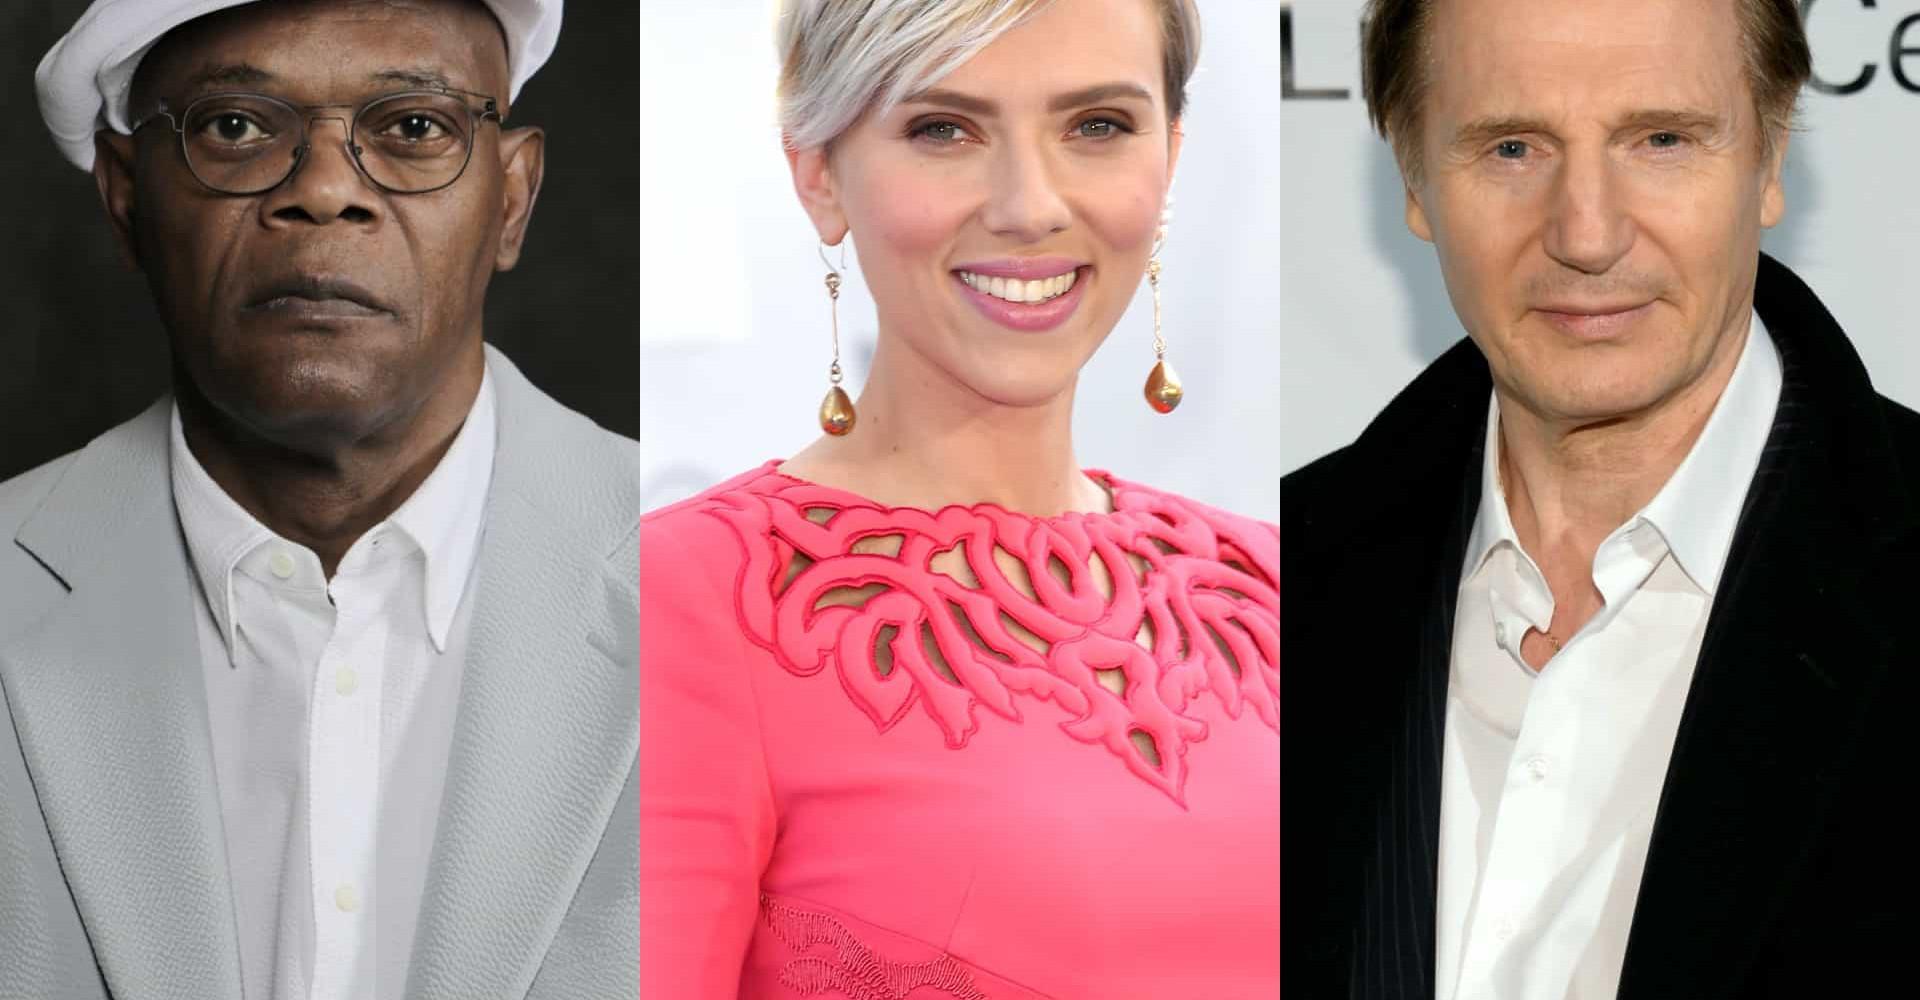 Disse skuespillere har aldrig vundet en Oscar eller en Golden Globe